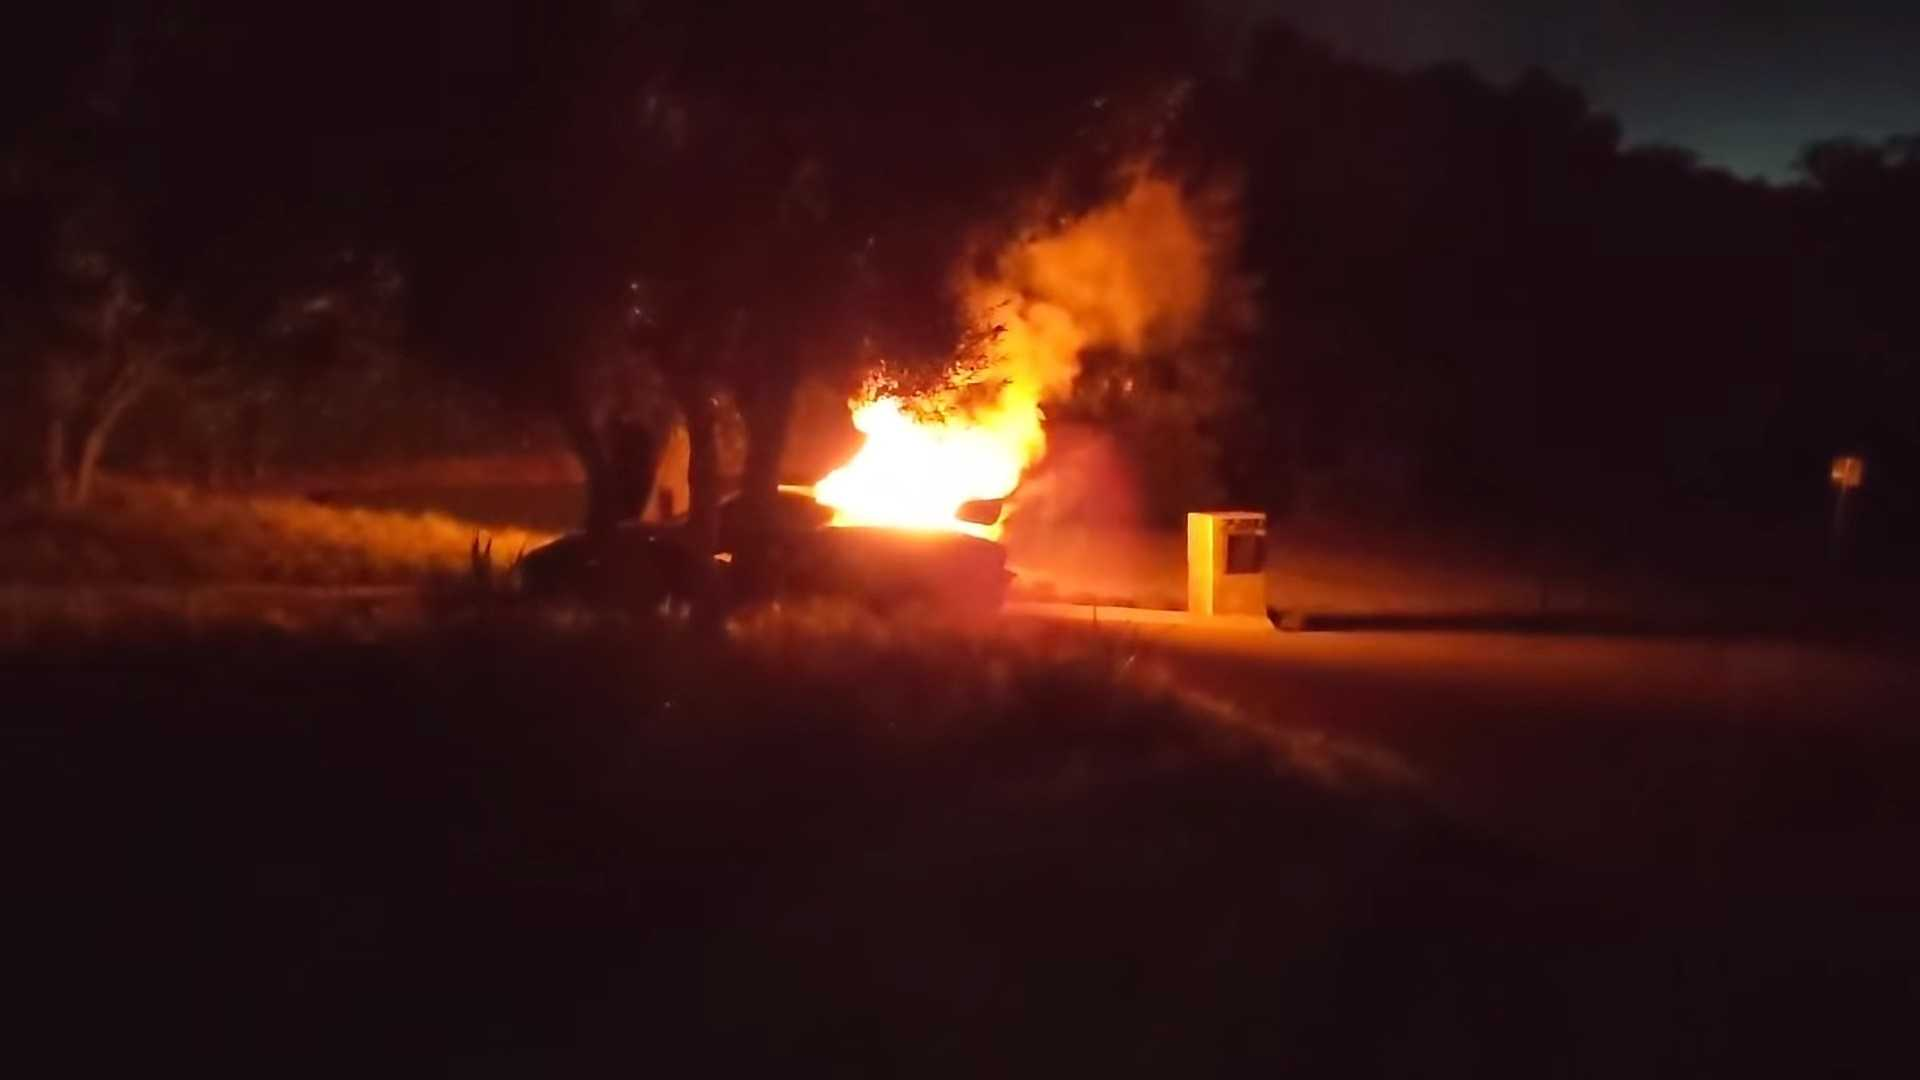 Salomondrin's McLaren Senna going up in flames